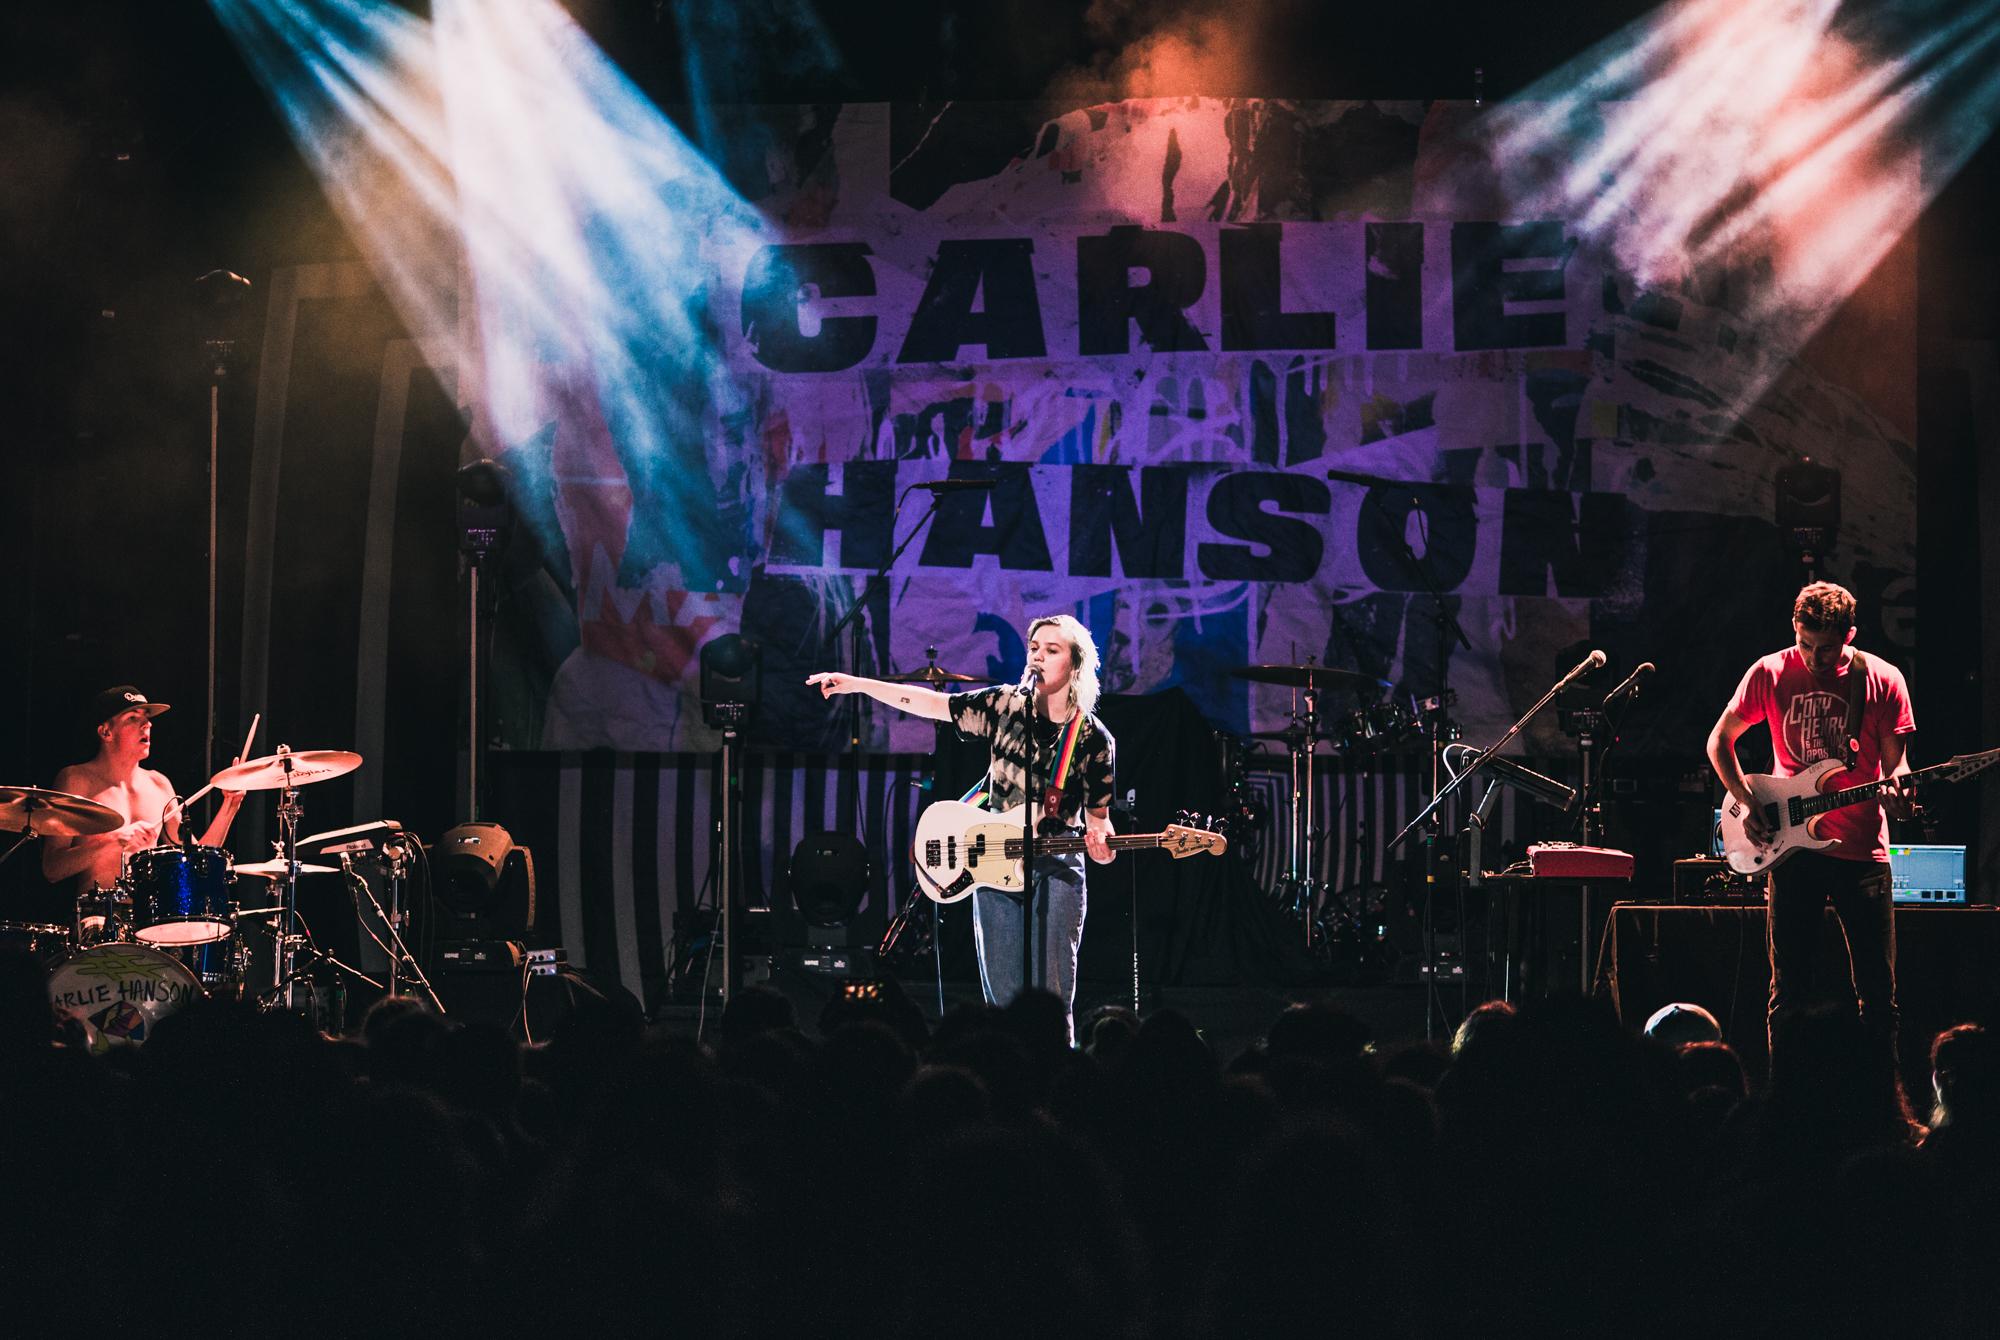 CarlieHanson-15.jpg